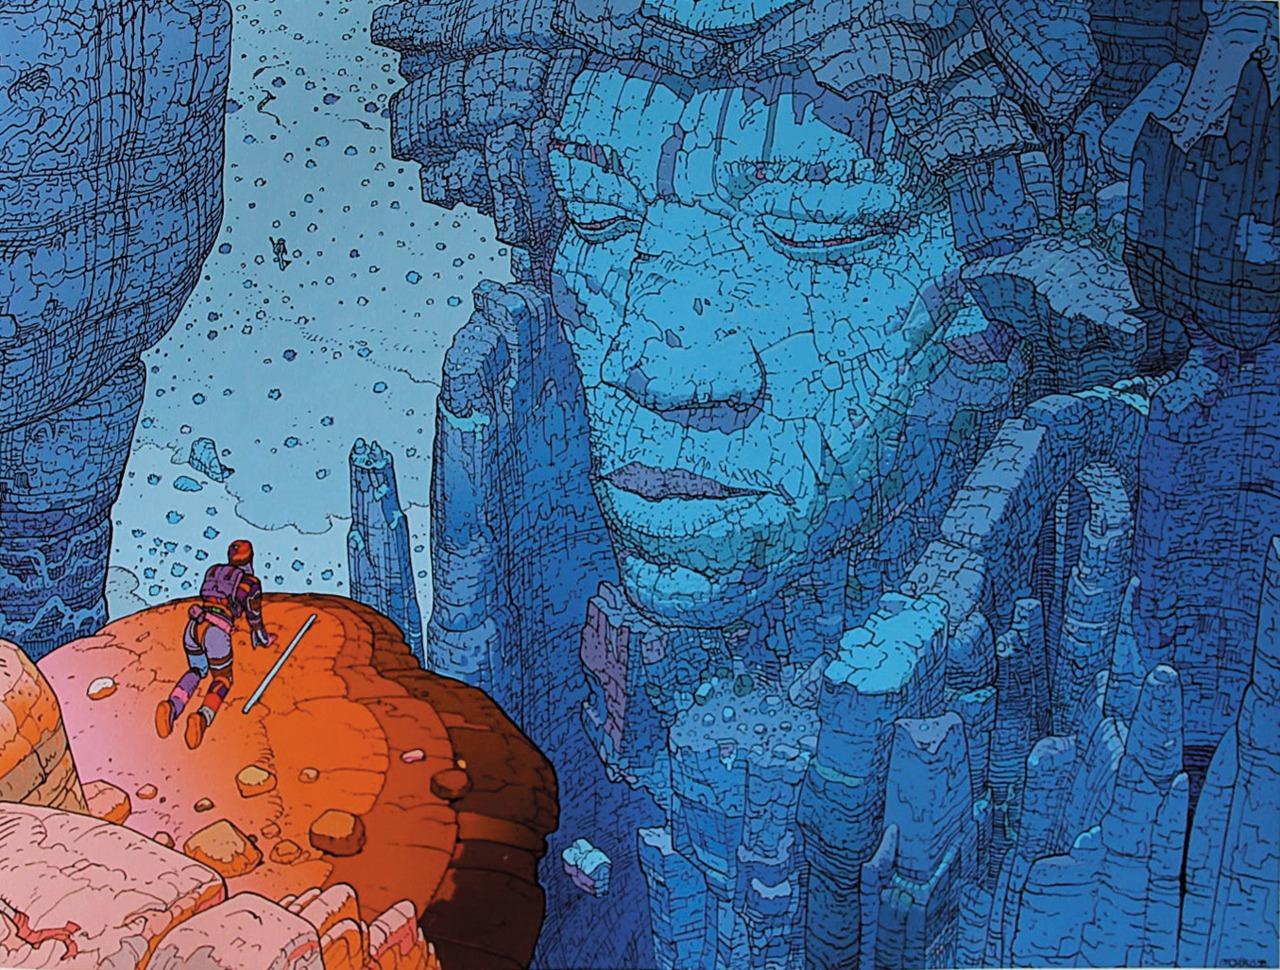 The Amazing Art of Moebius (Jean Giraud) and The 18 Art Tips ...